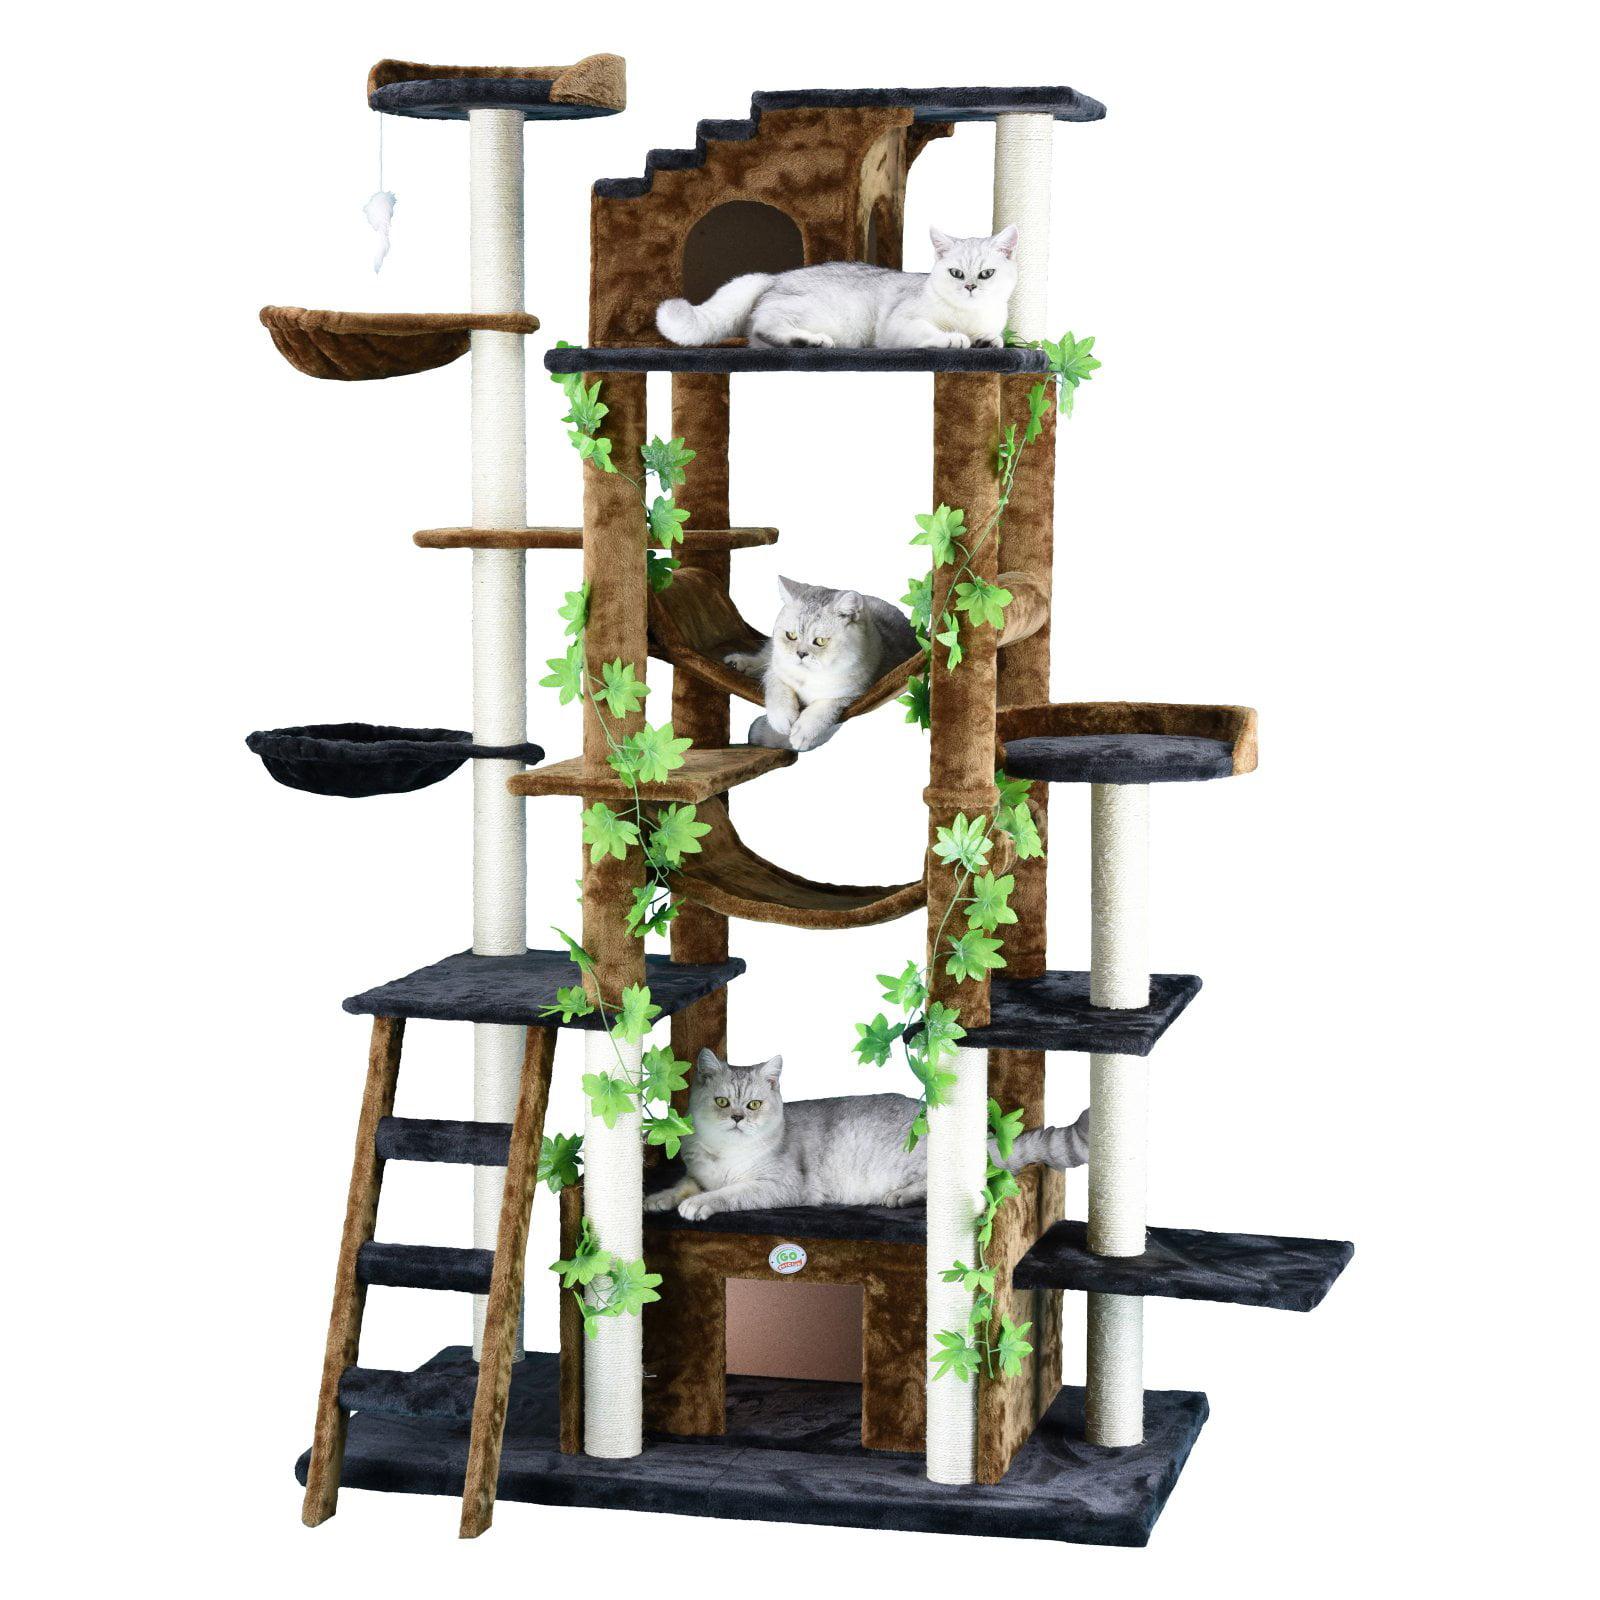 Go Pet Club Cat Tree Furniture 77 in. High Jungle Brown Black by Go Pet Club LLC